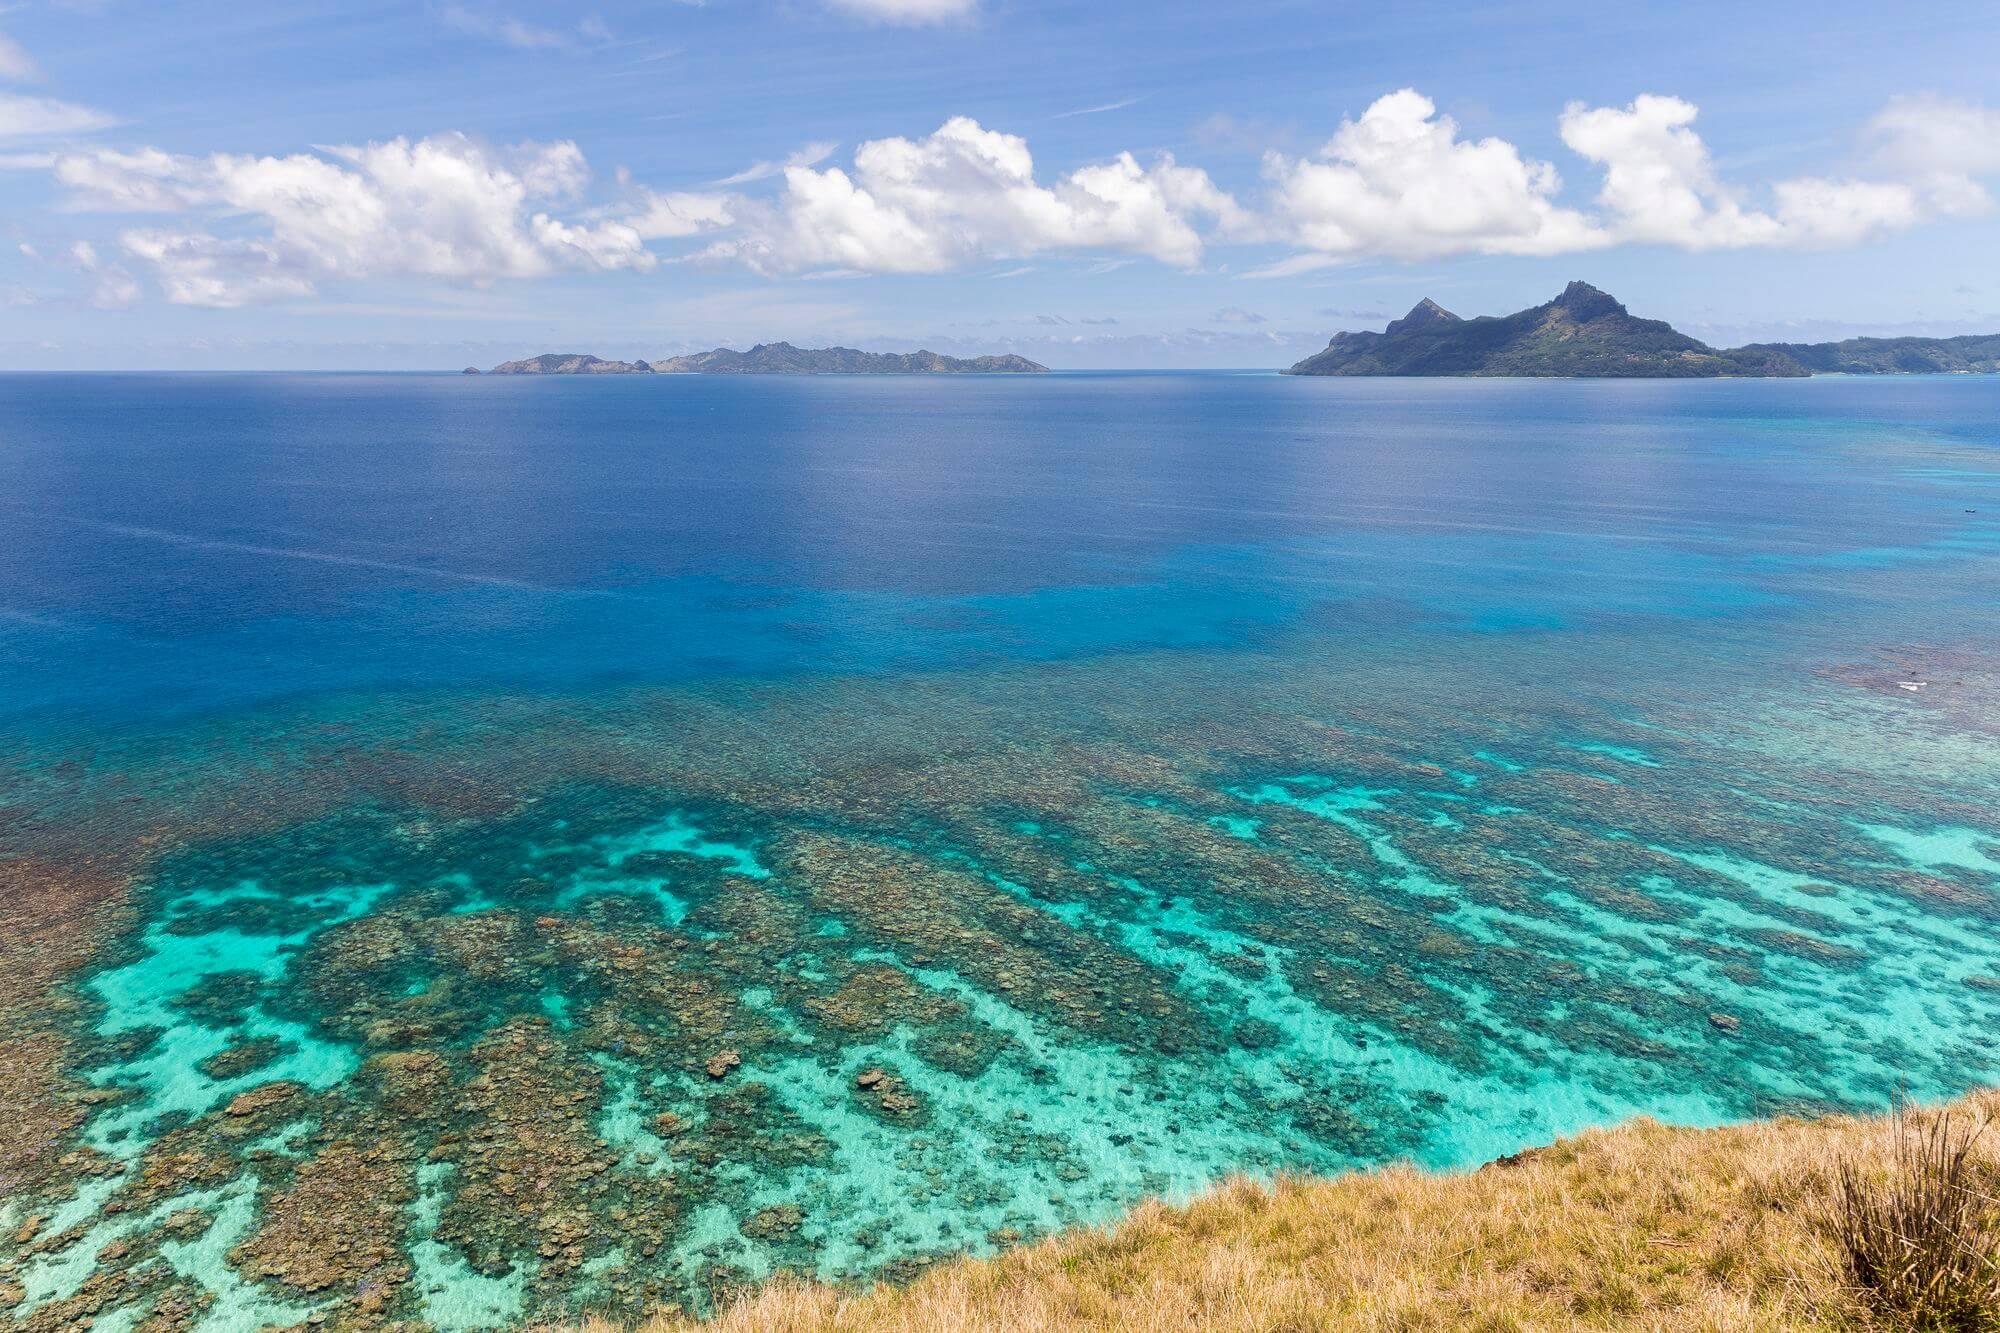 iles gambier, une merveille en polynésie